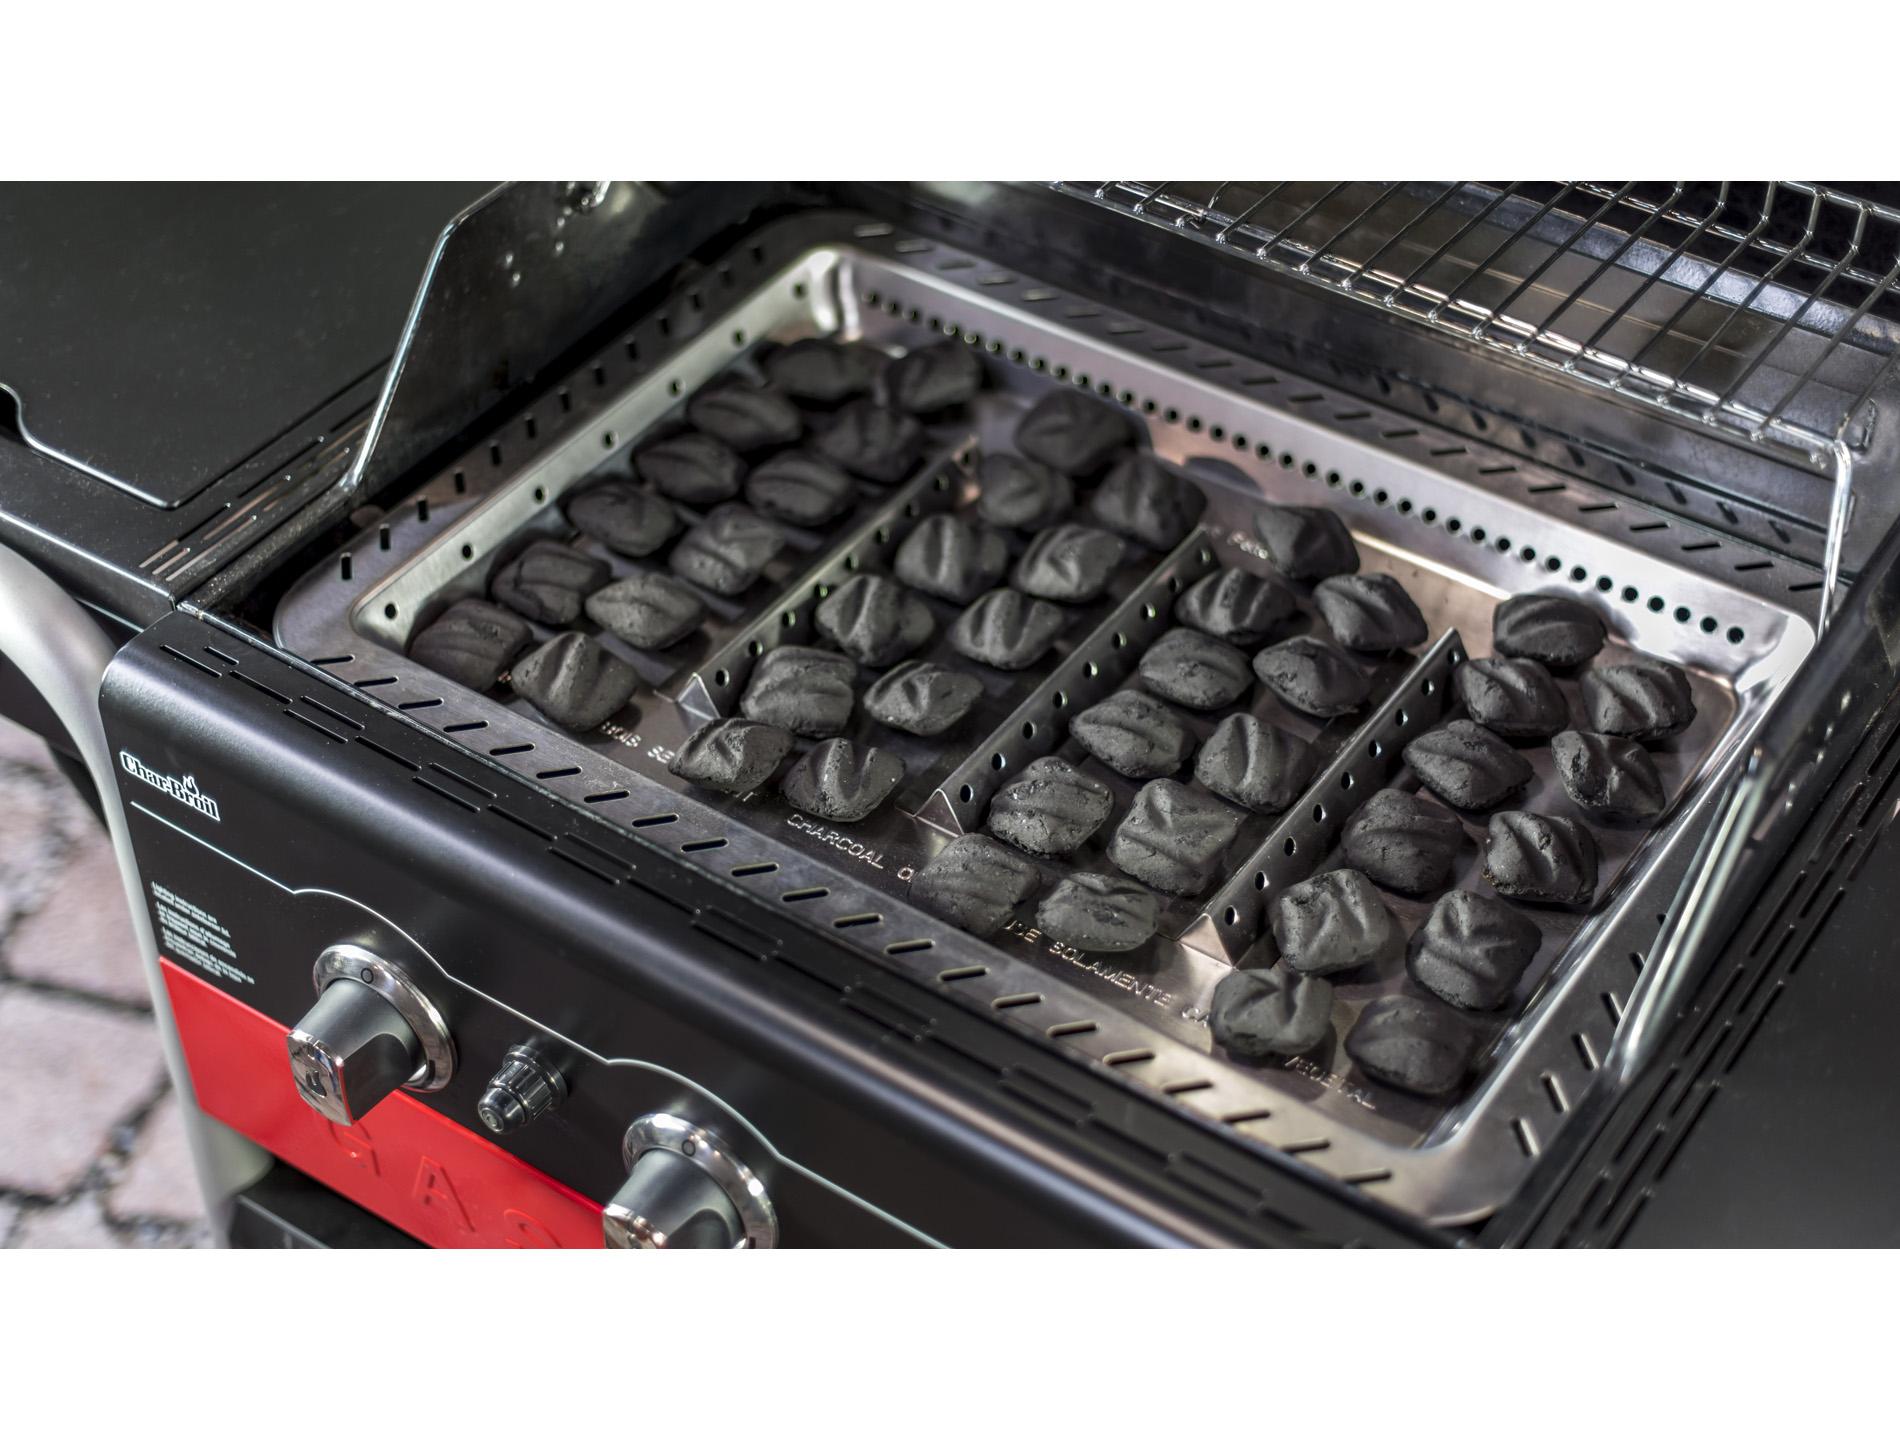 barbecue mixte gaz et charbon char broil gas2coal 330. Black Bedroom Furniture Sets. Home Design Ideas